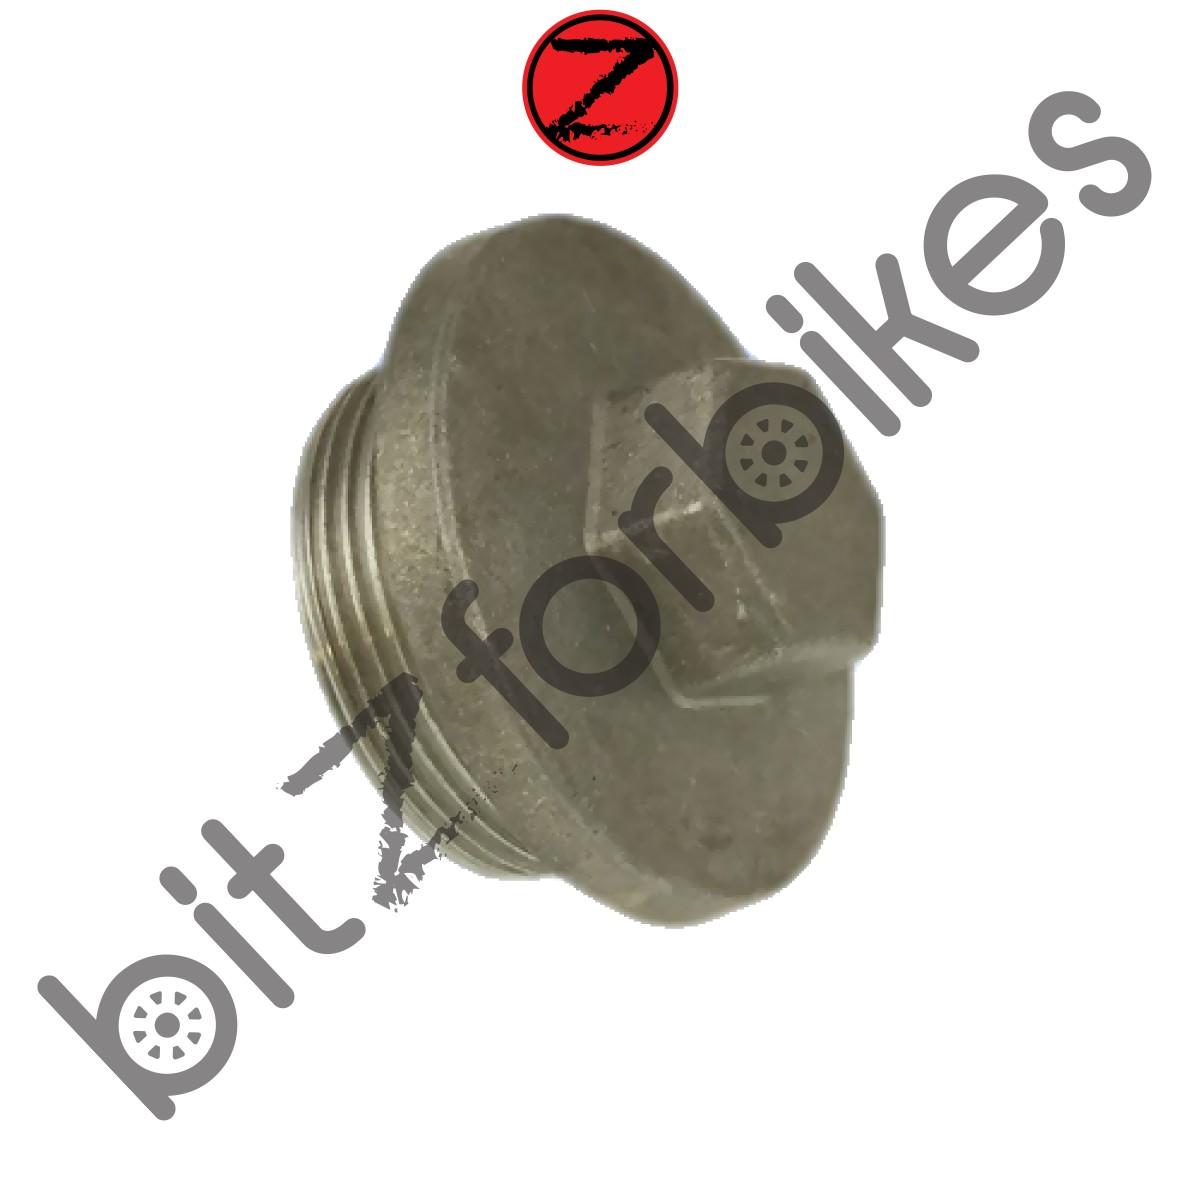 oil screw drain plug pegasus s 50 lx 4t 2010 to 2014 ebay. Black Bedroom Furniture Sets. Home Design Ideas